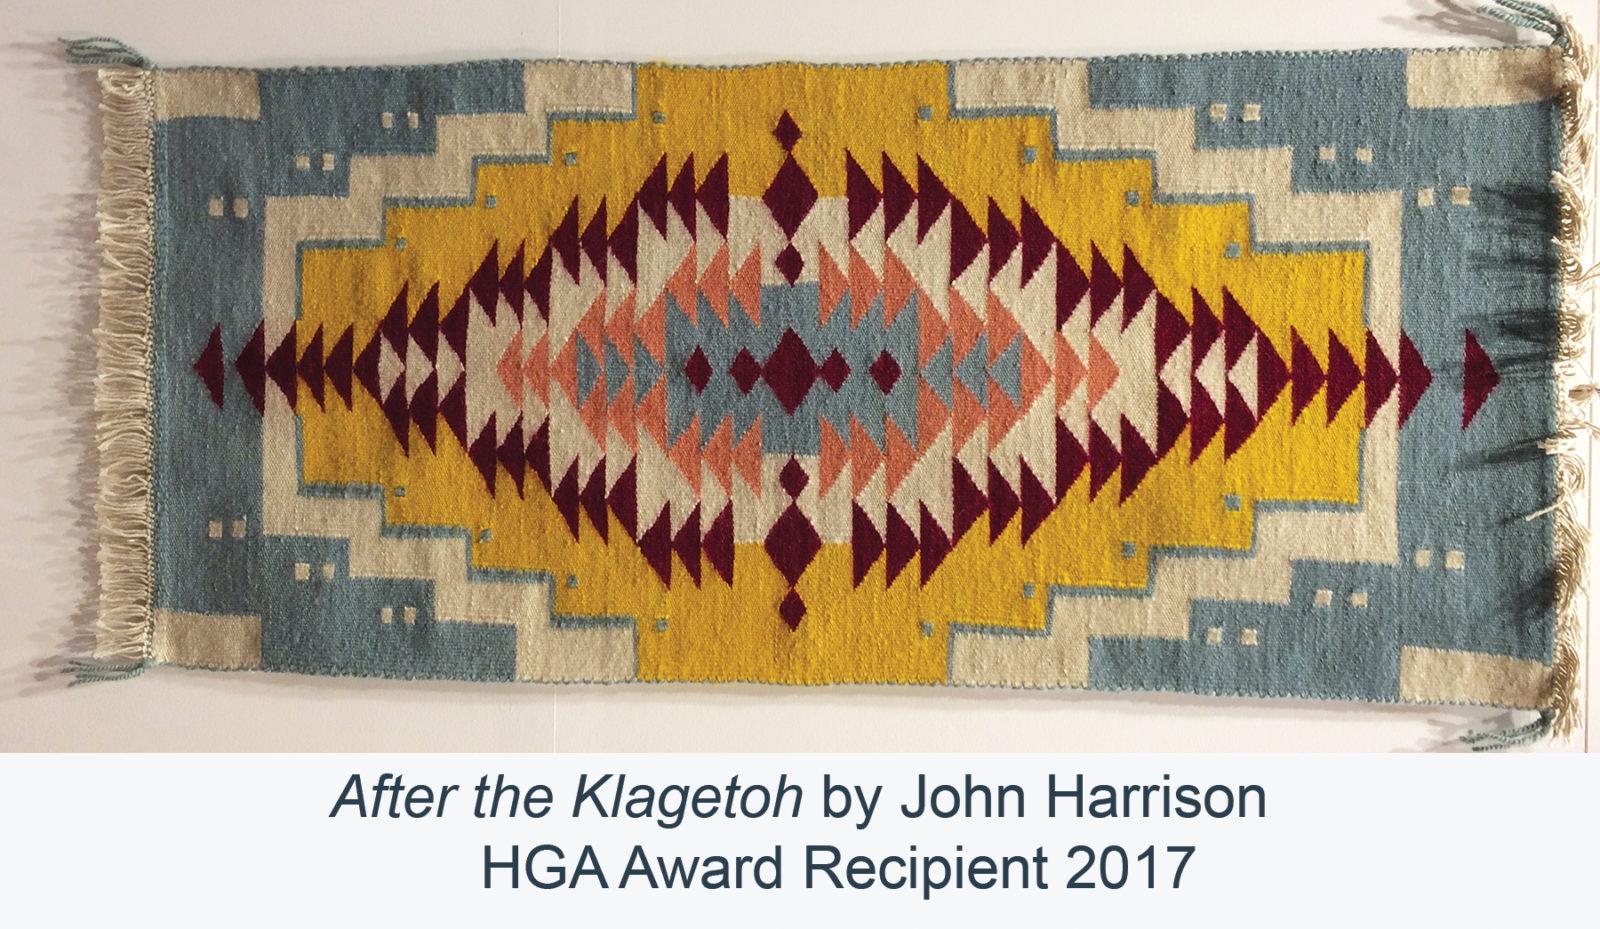 HGA Award